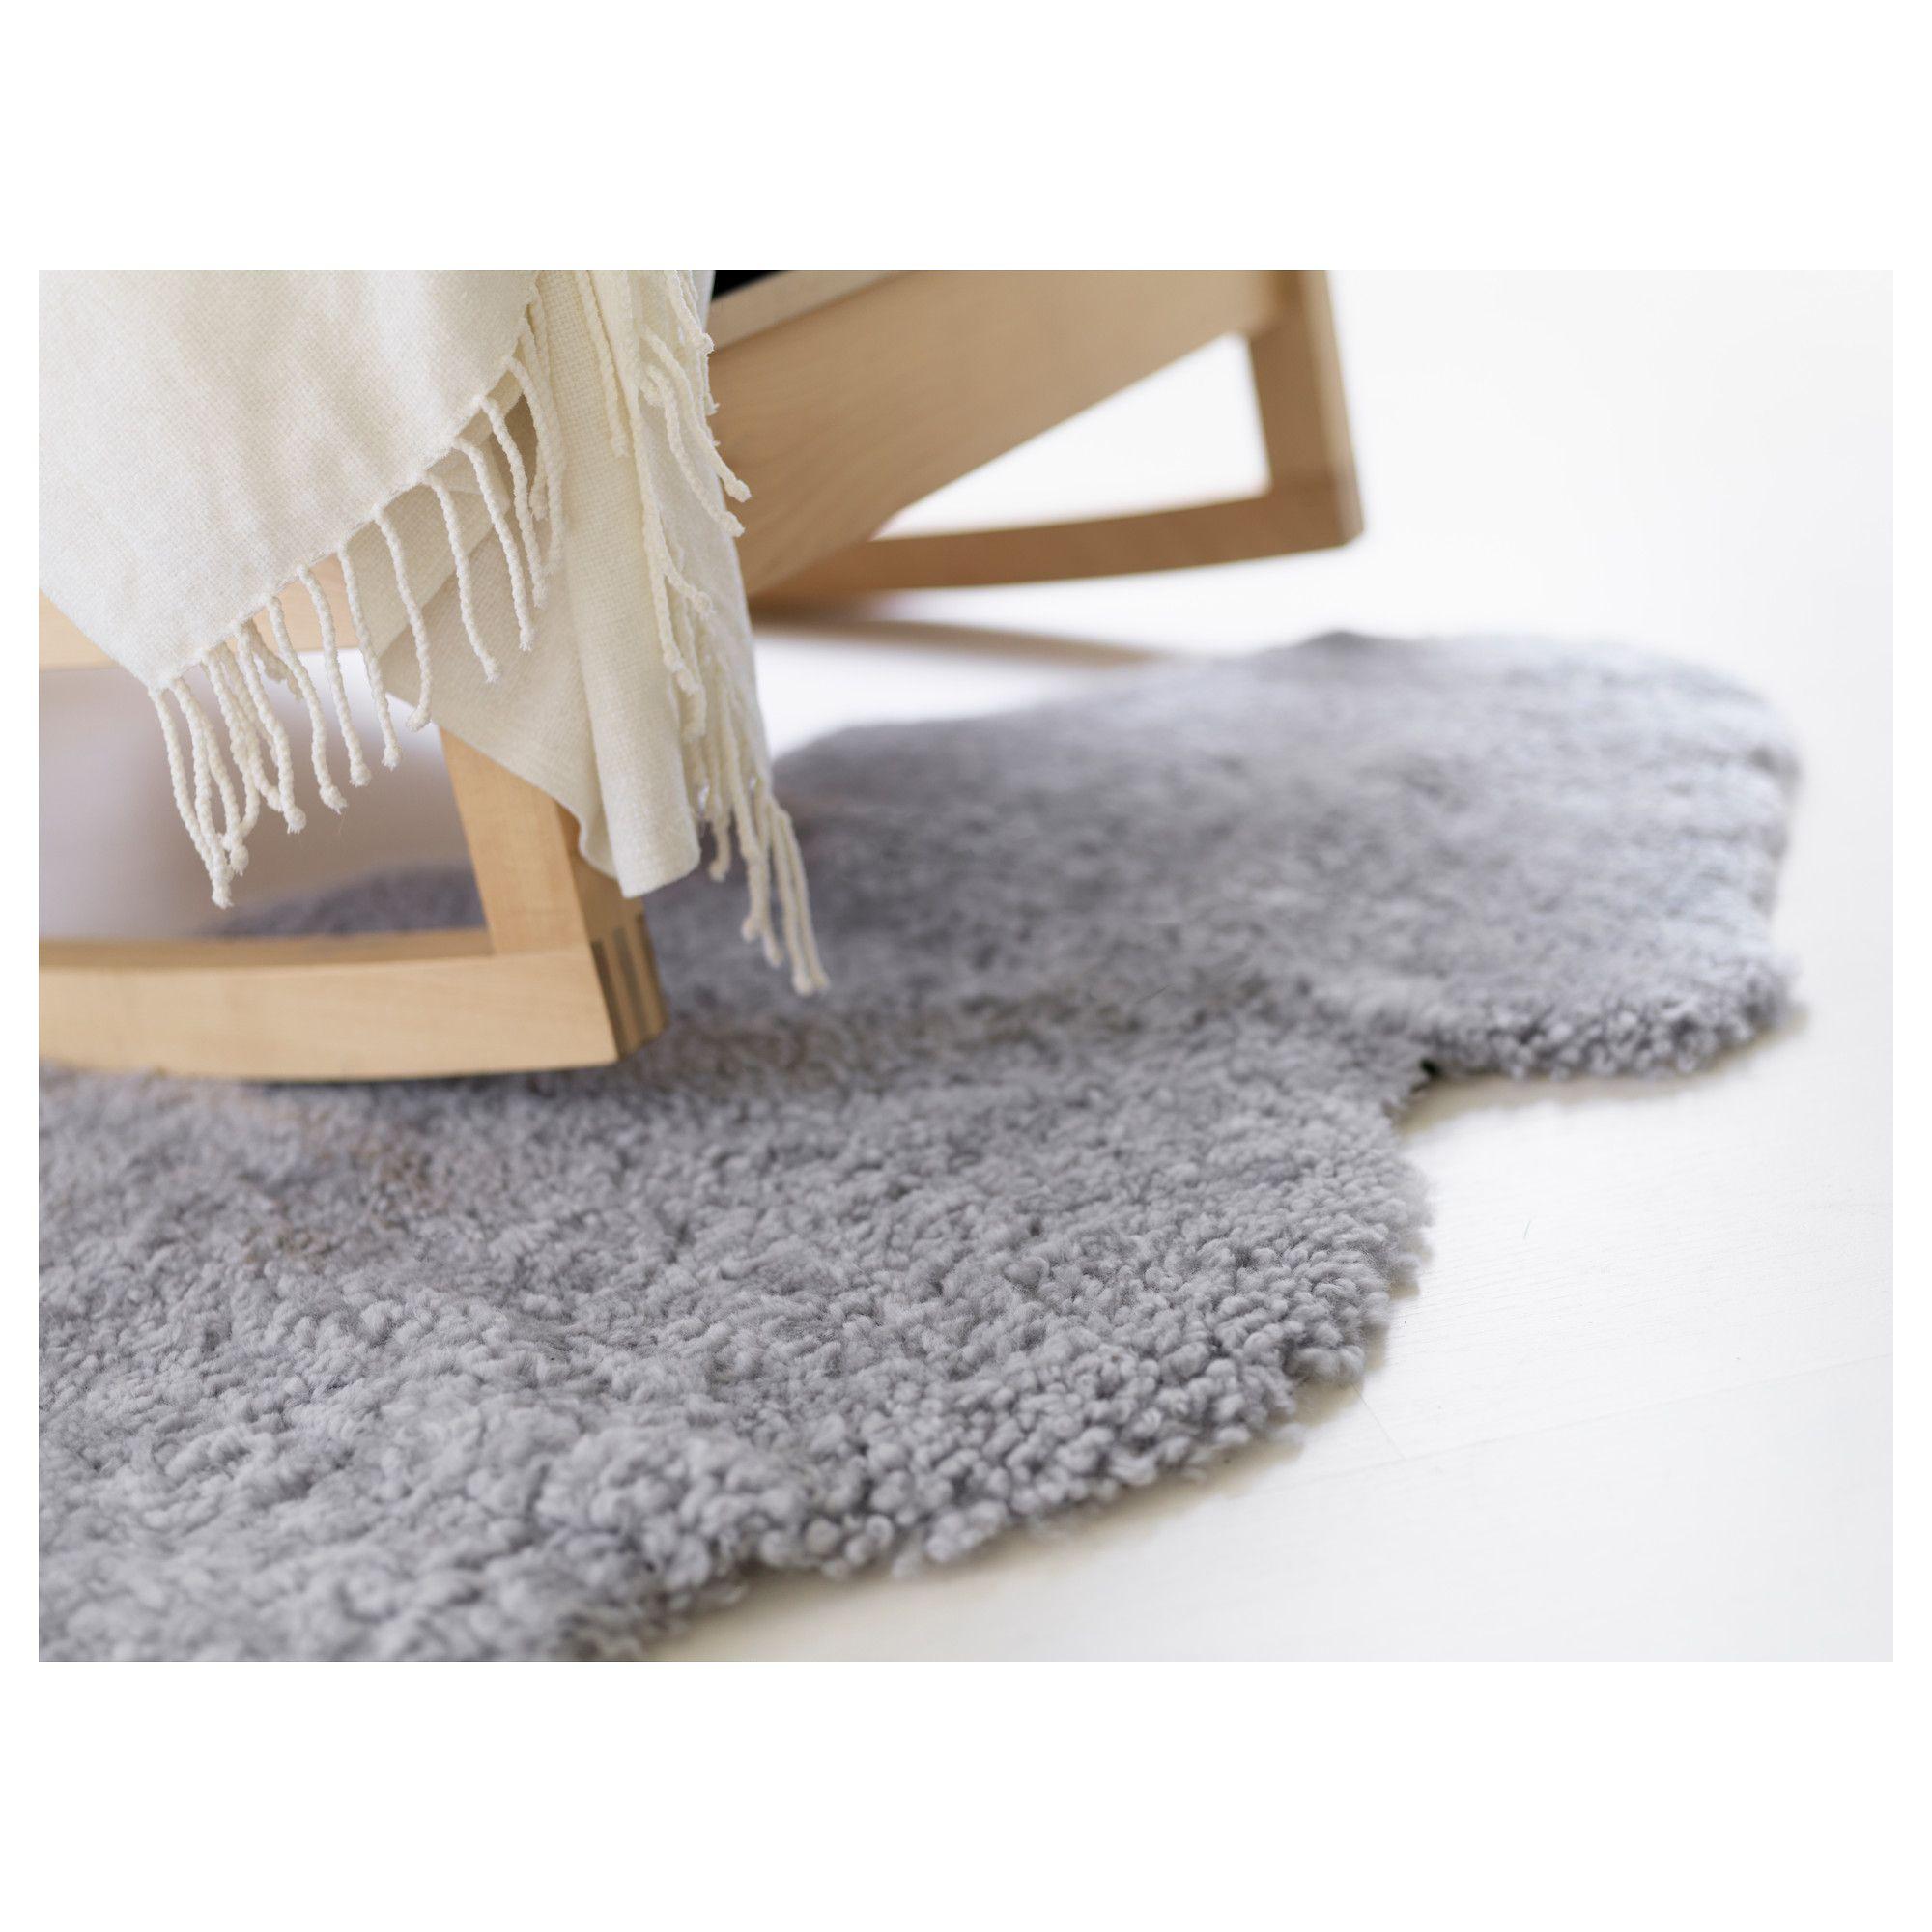 Ikea Sheepskin Rug Large: Rugs Online, Modern Rugs And Ranges